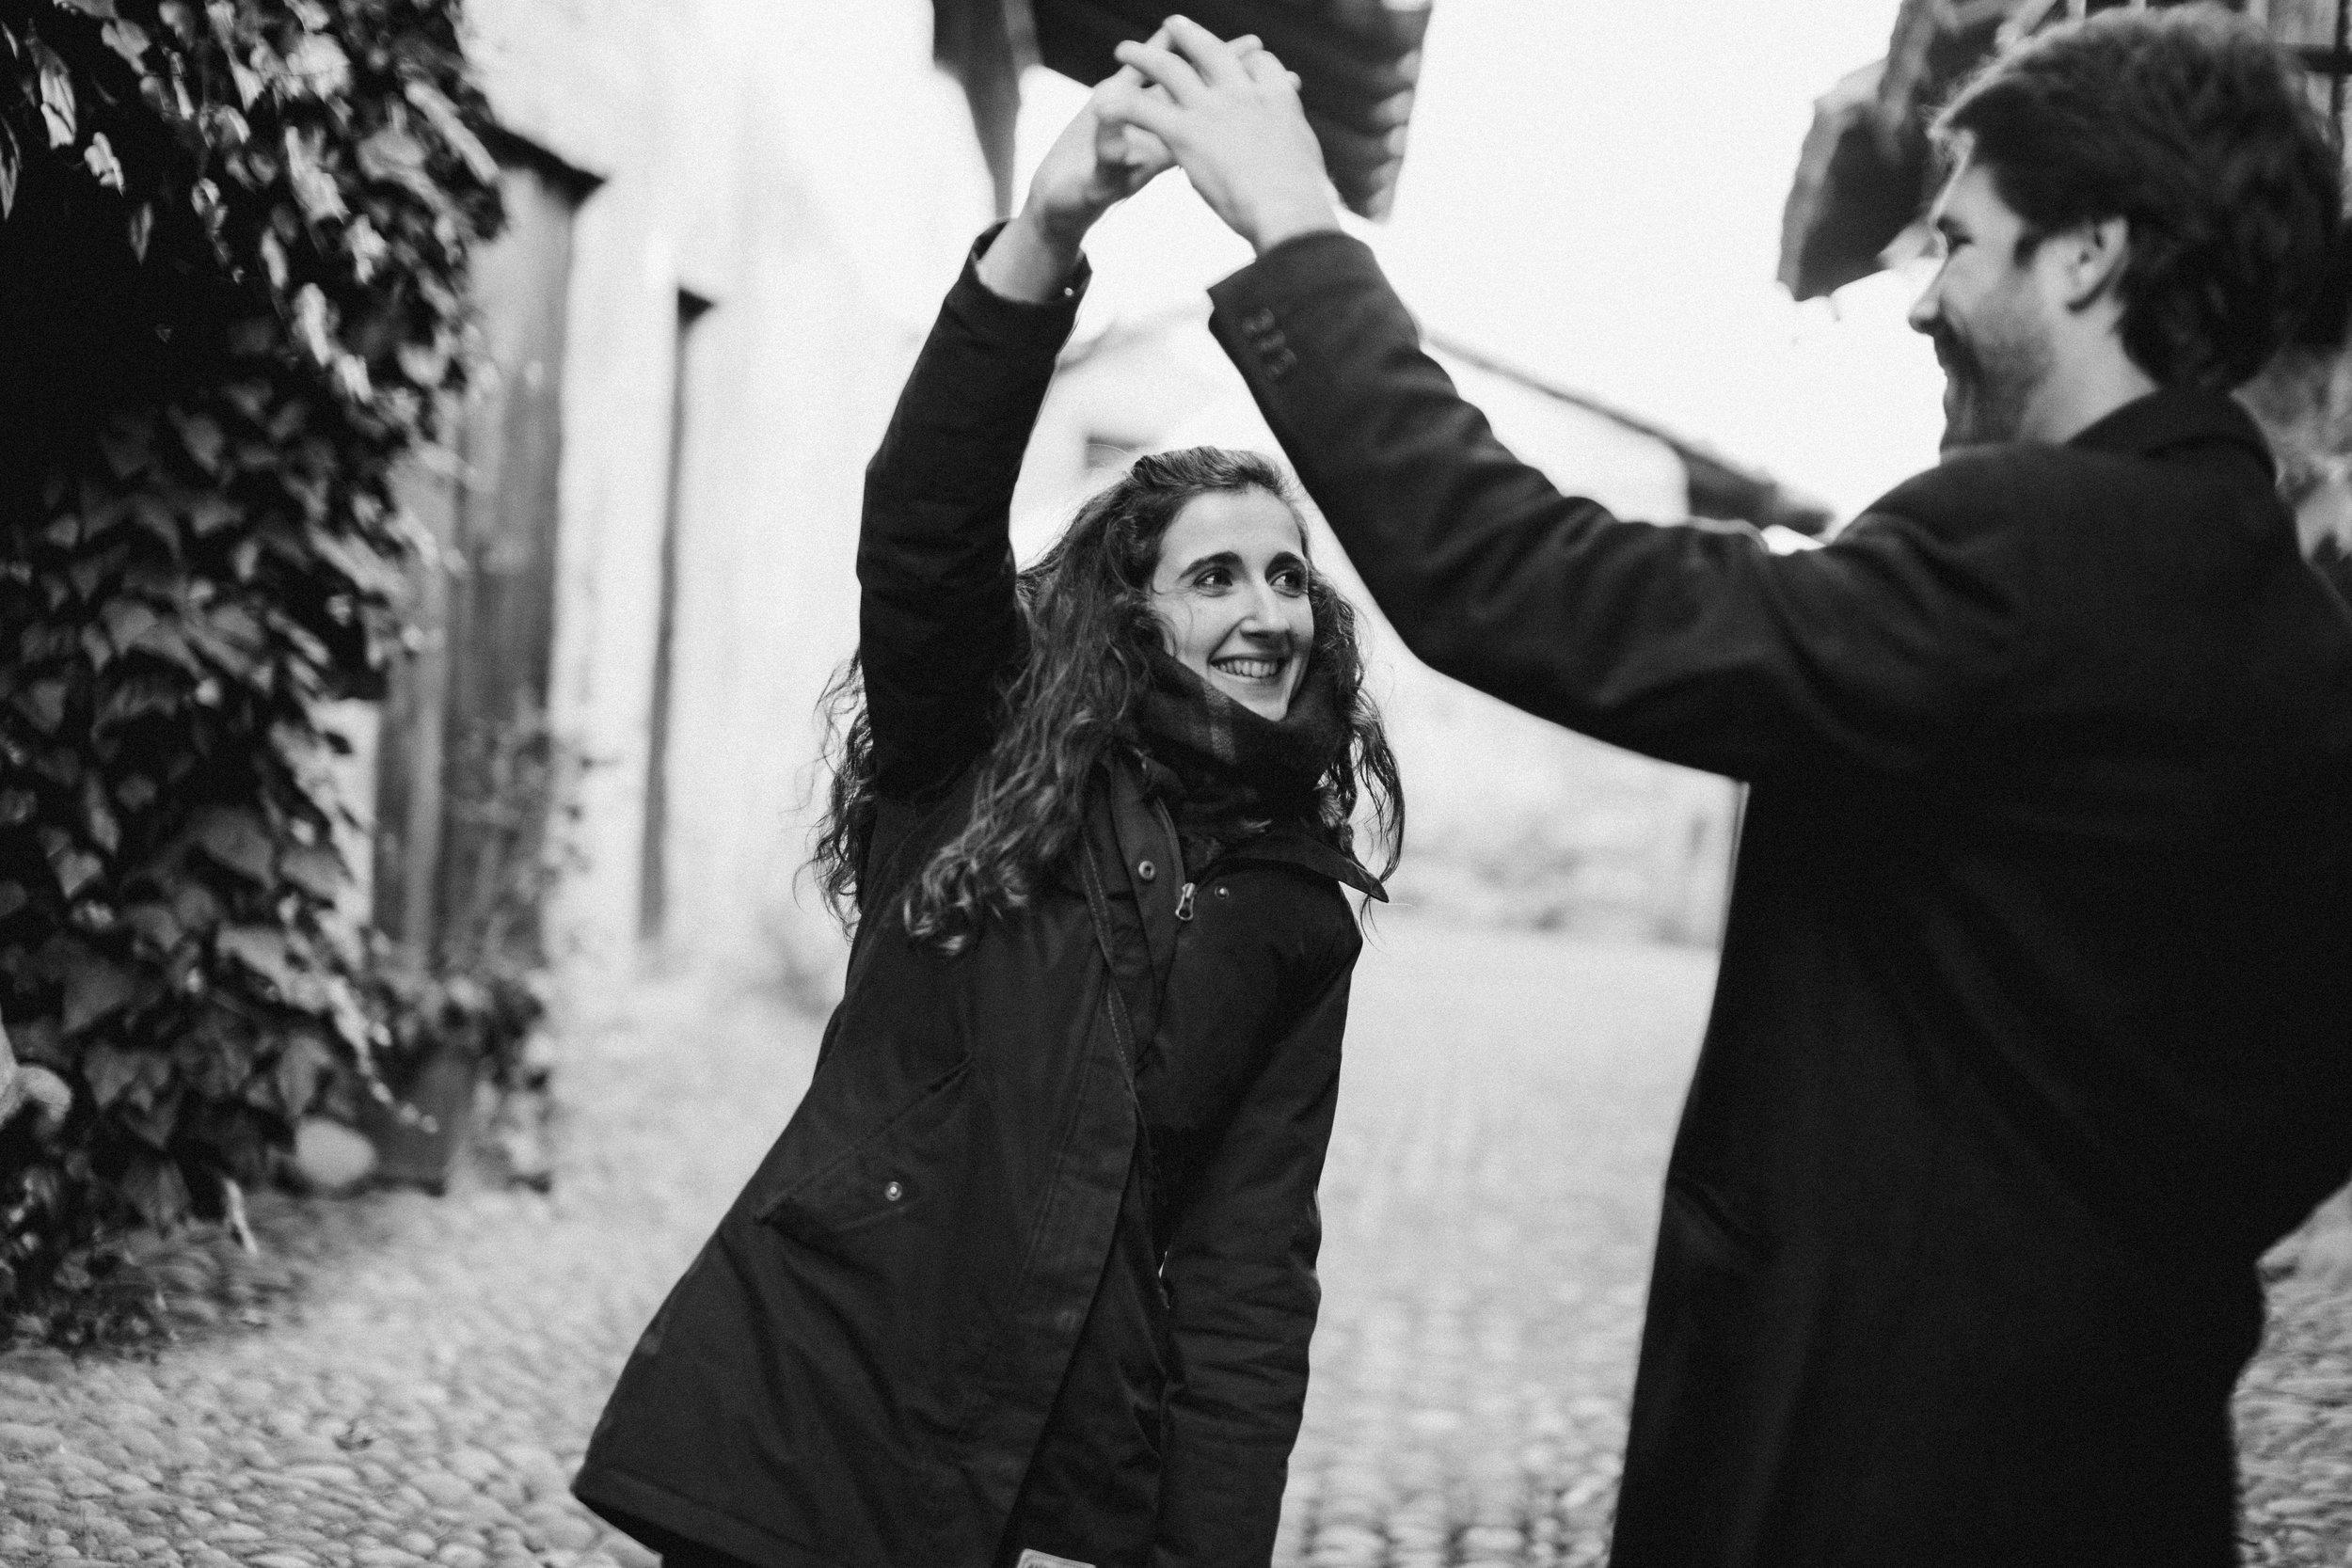 029 - Elisa + Riccardo - engagement.JPG